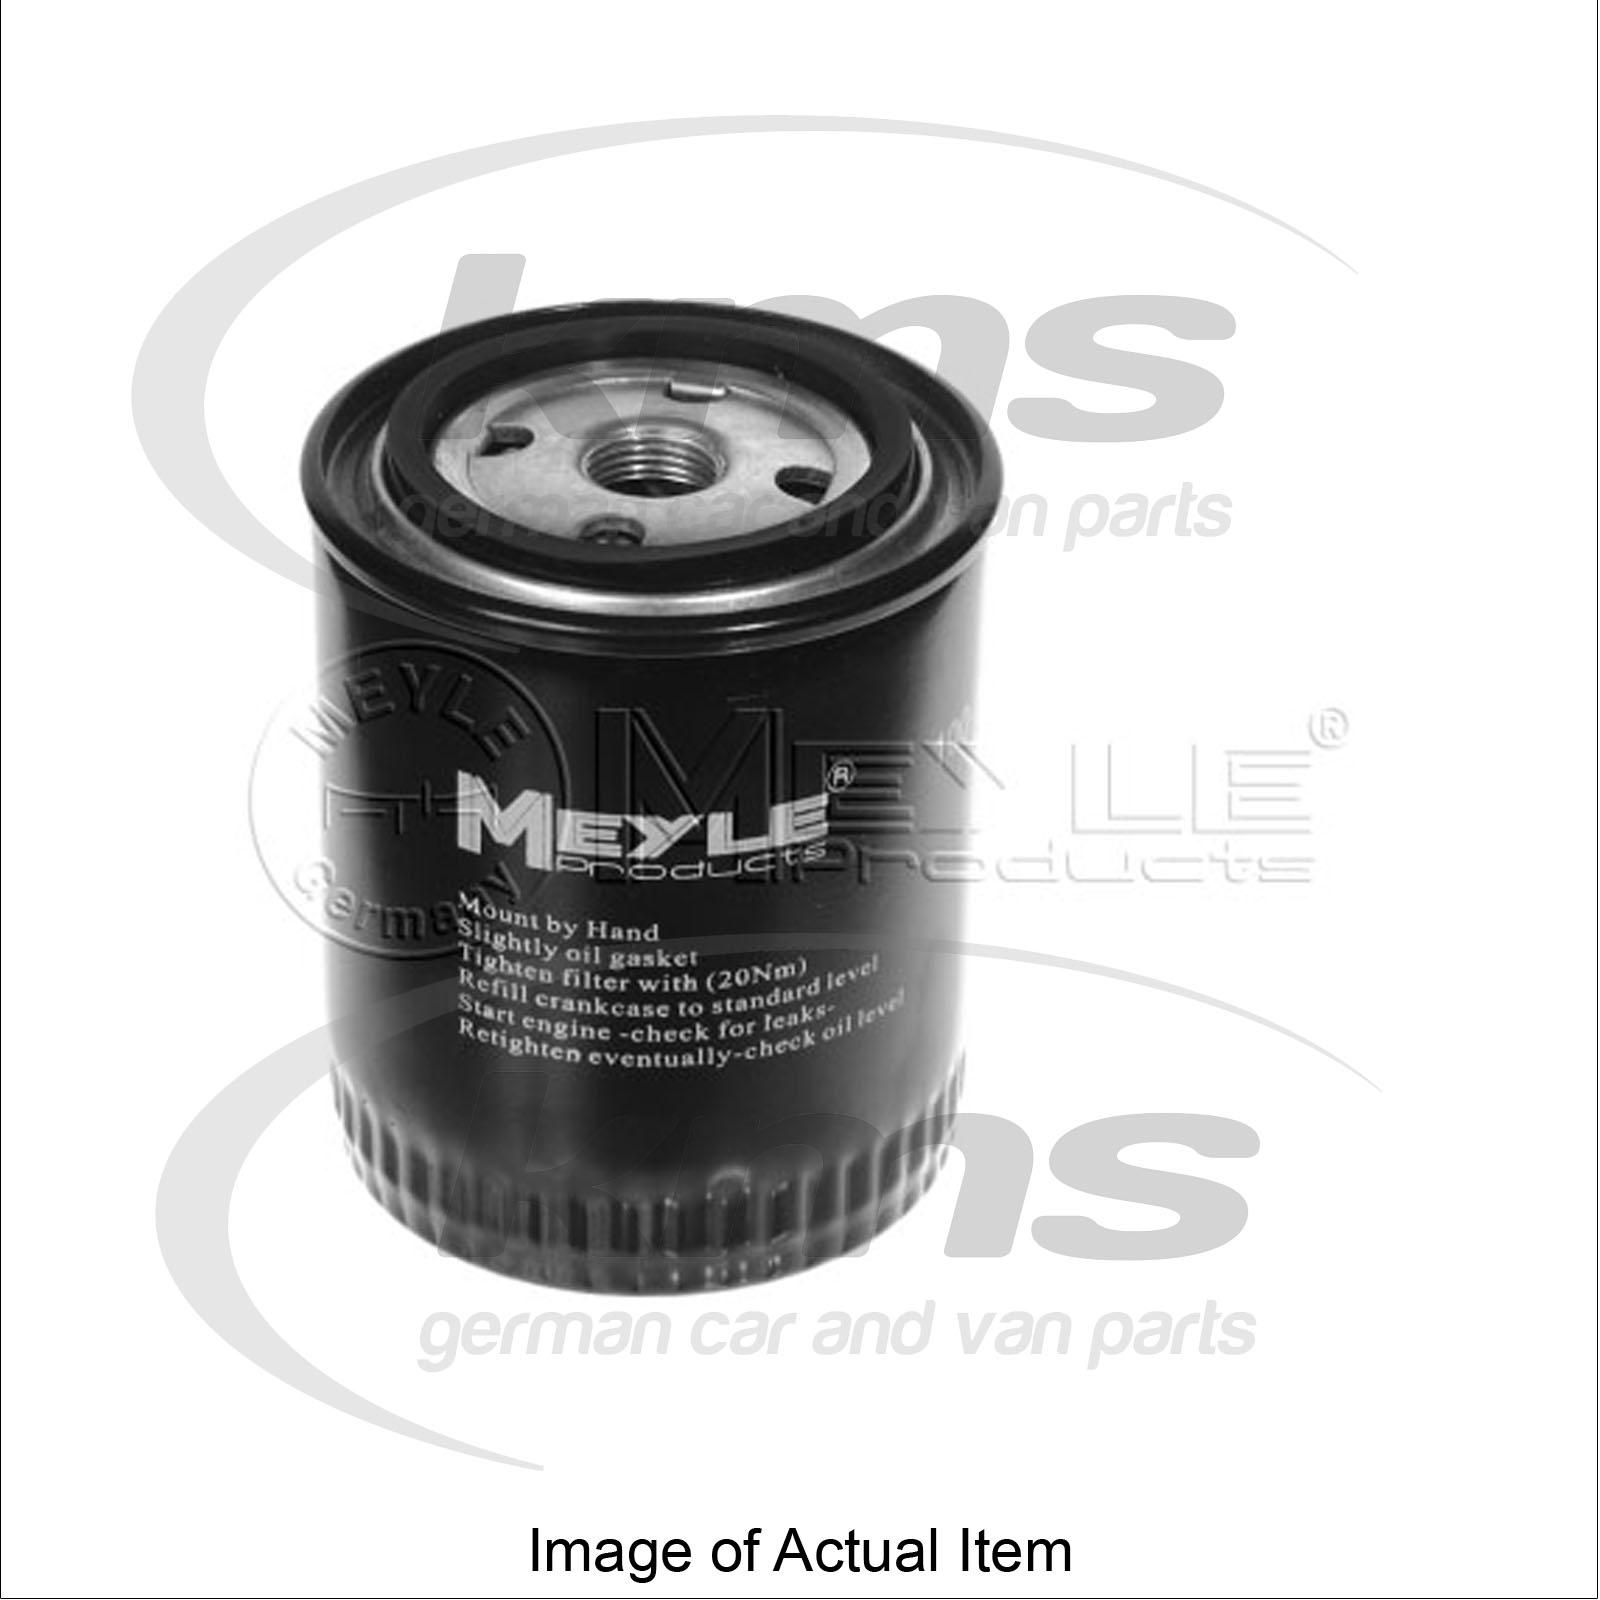 Oil filter audi a6 4b c5 2 7 t quattro 250bhp top for Audi a6 motor oil